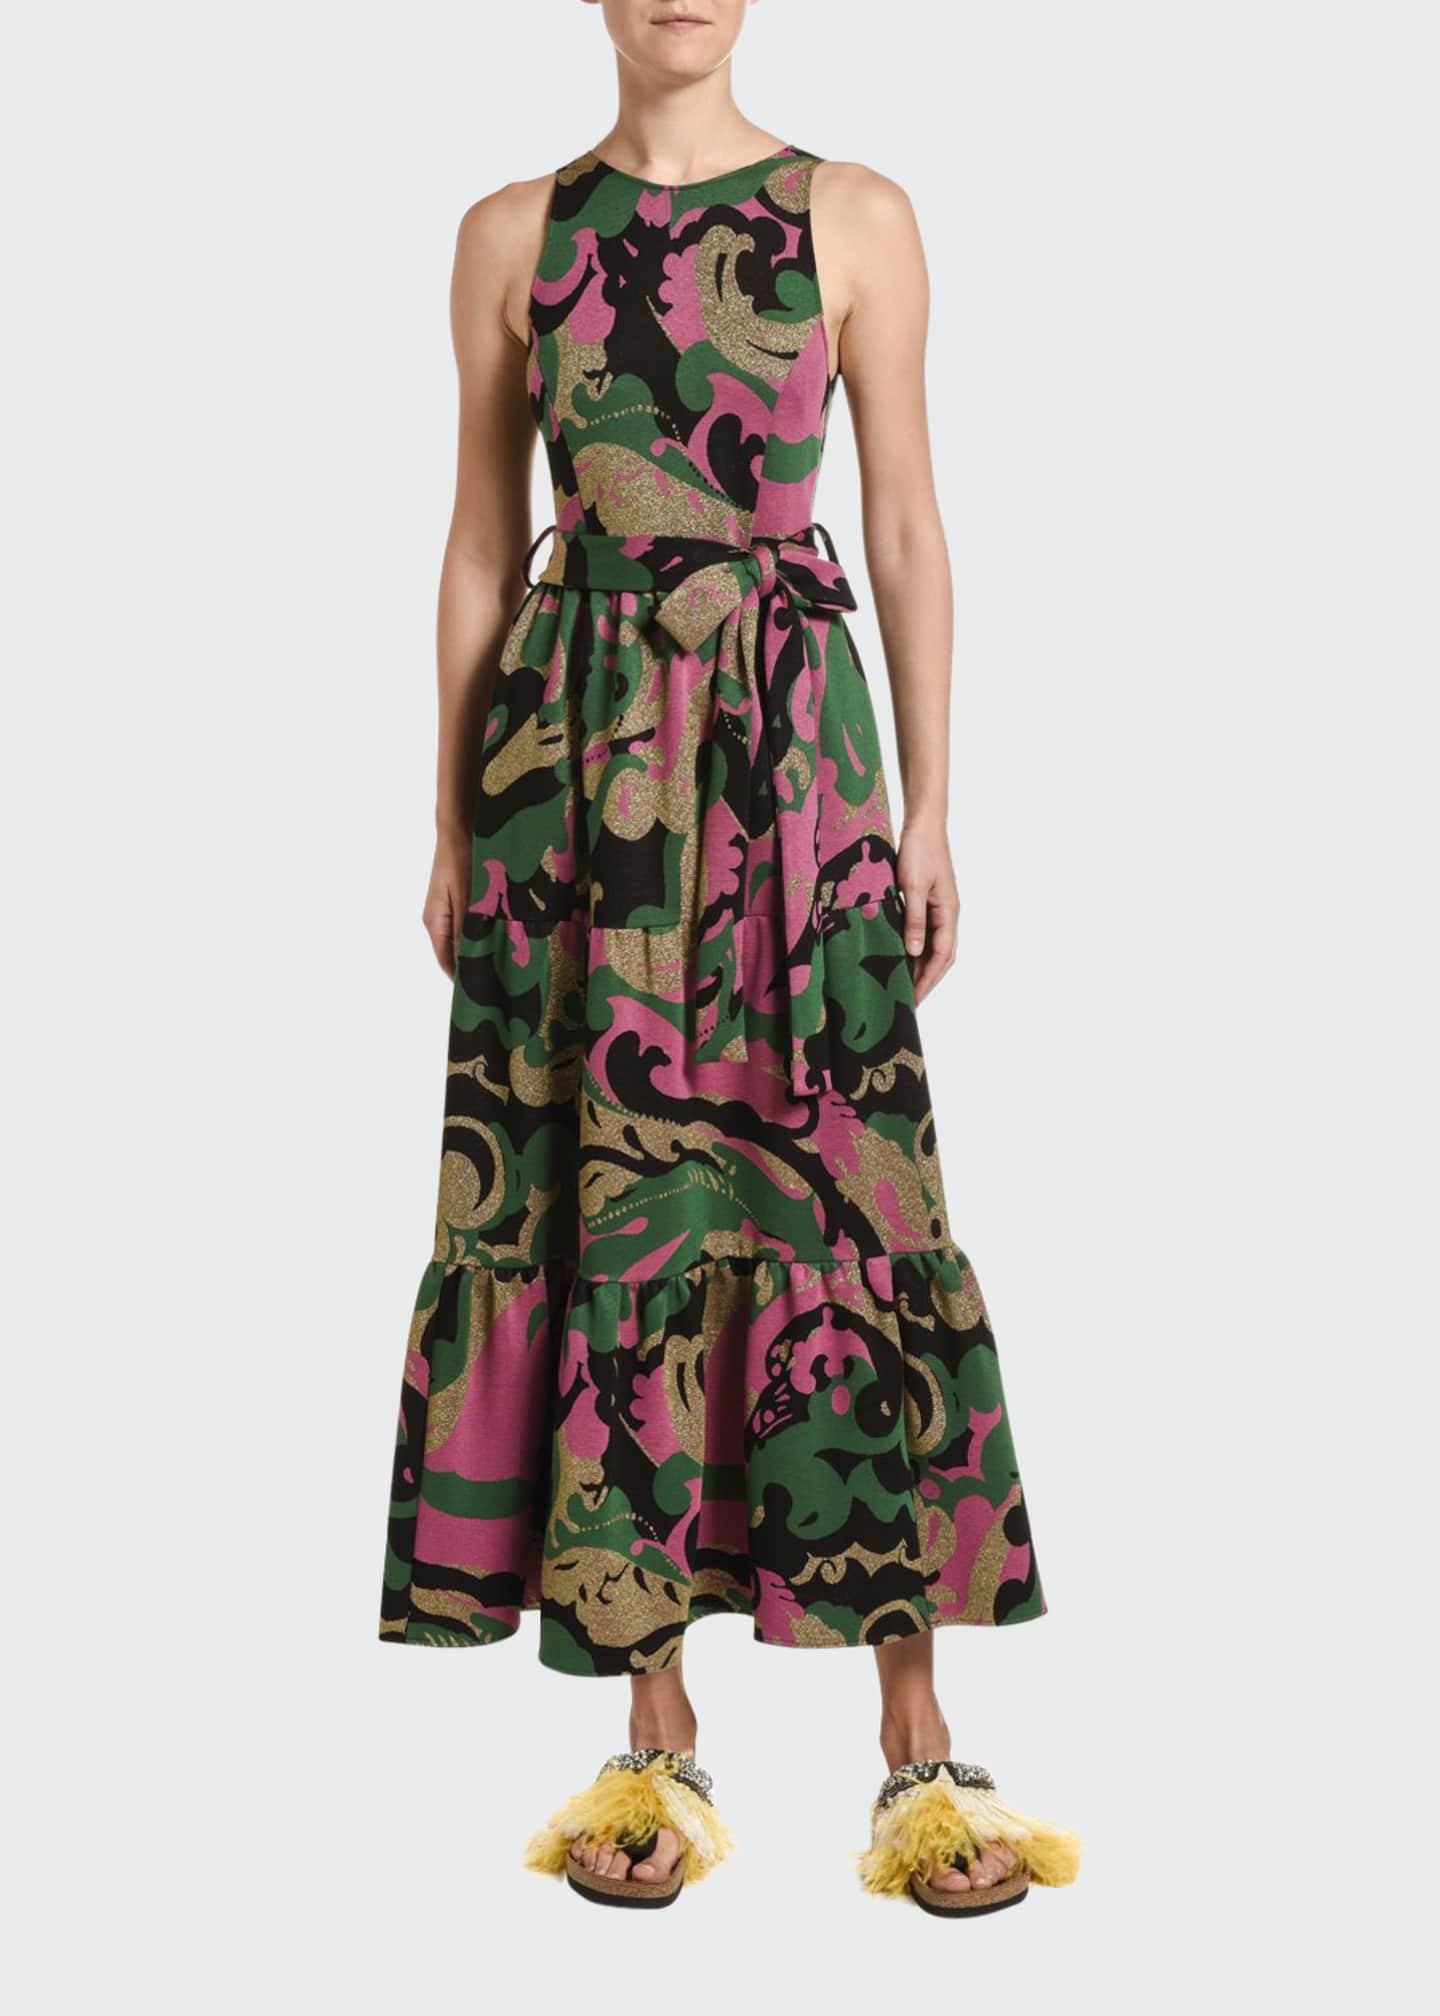 Double J Pellicano Americano Sleeveless Tiered Dress